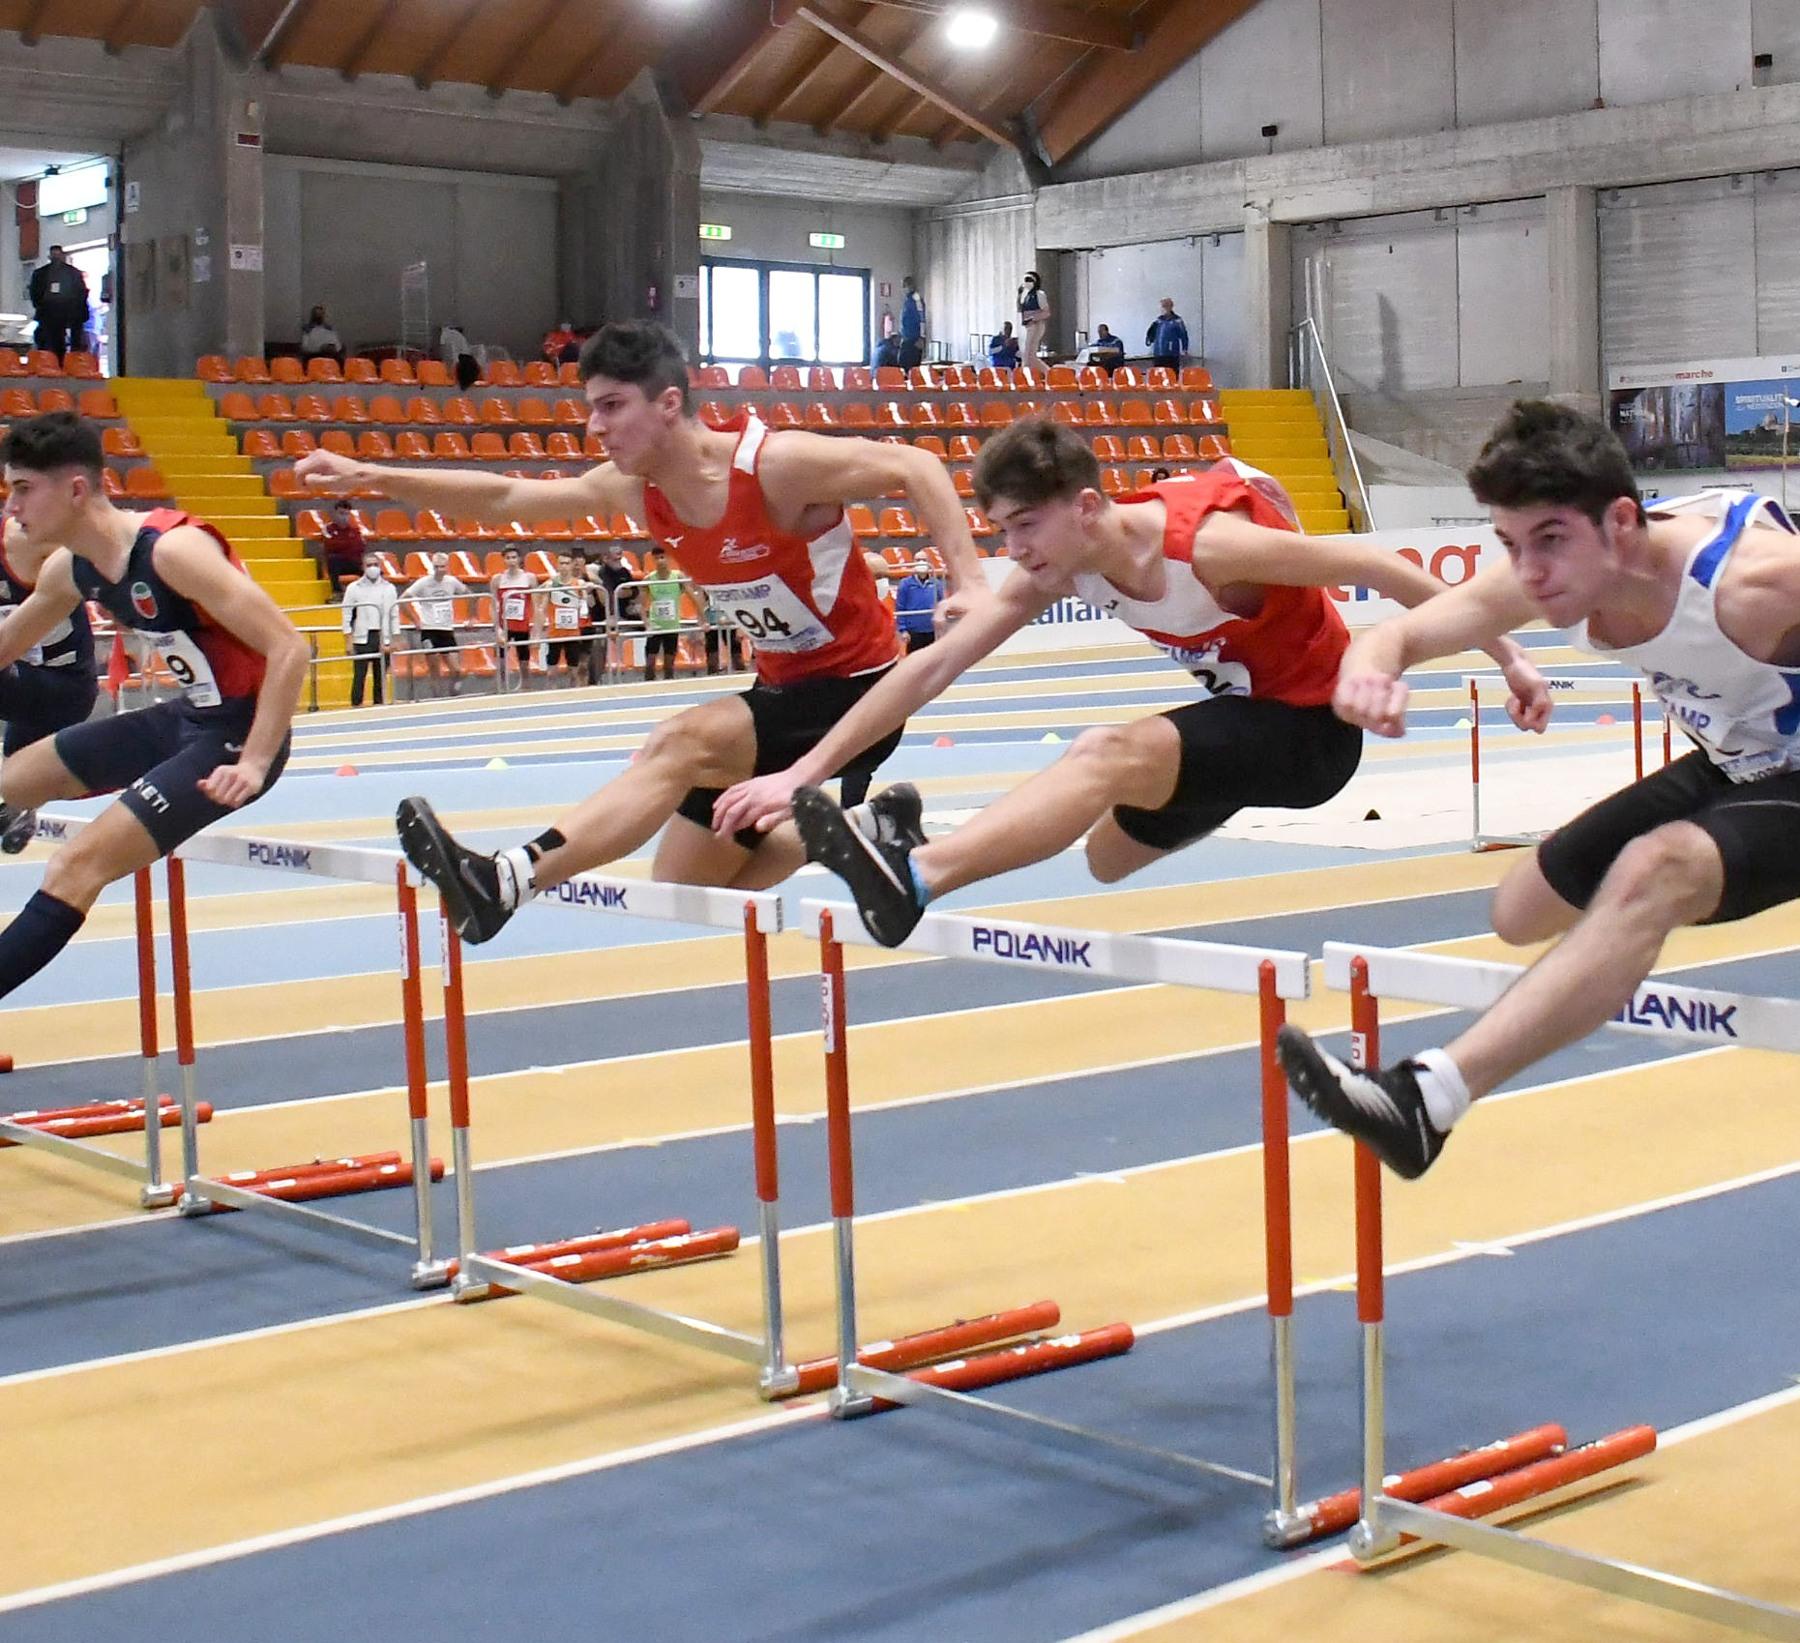 atletica-Romeo-Monaci-nei-110-ostacoli.